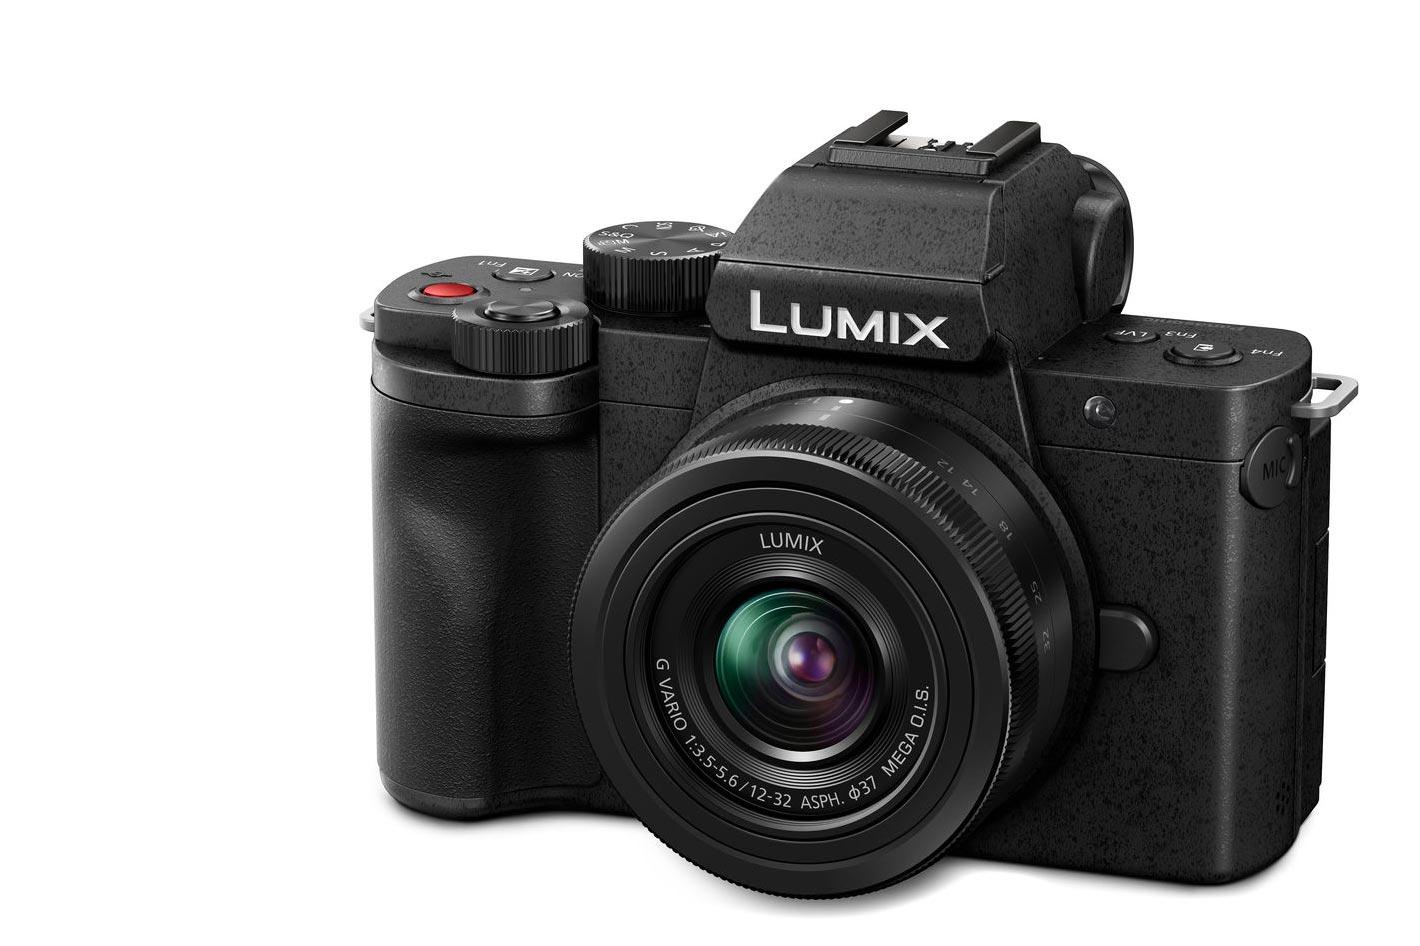 Panasonic LUMIX G100: a vlogging camera to seduce smartphone users